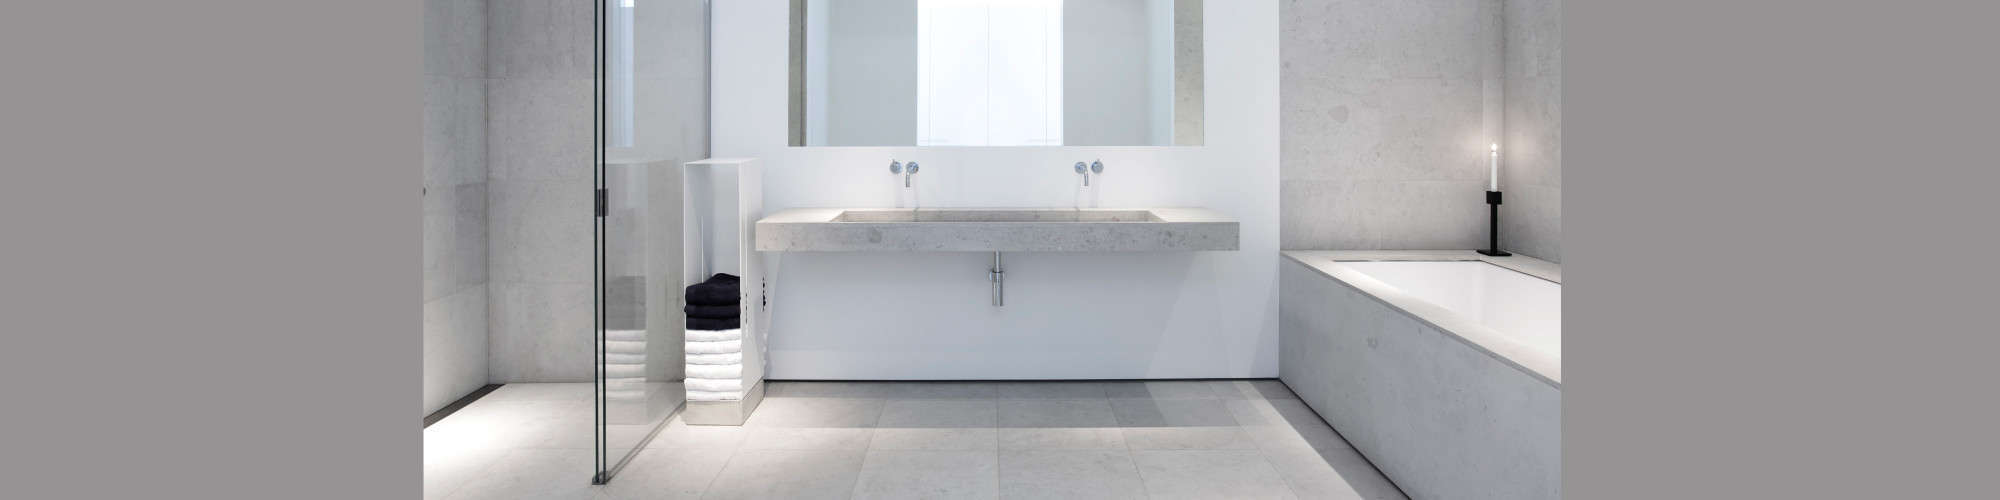 manhattan_caninet_bathroom-2000x500